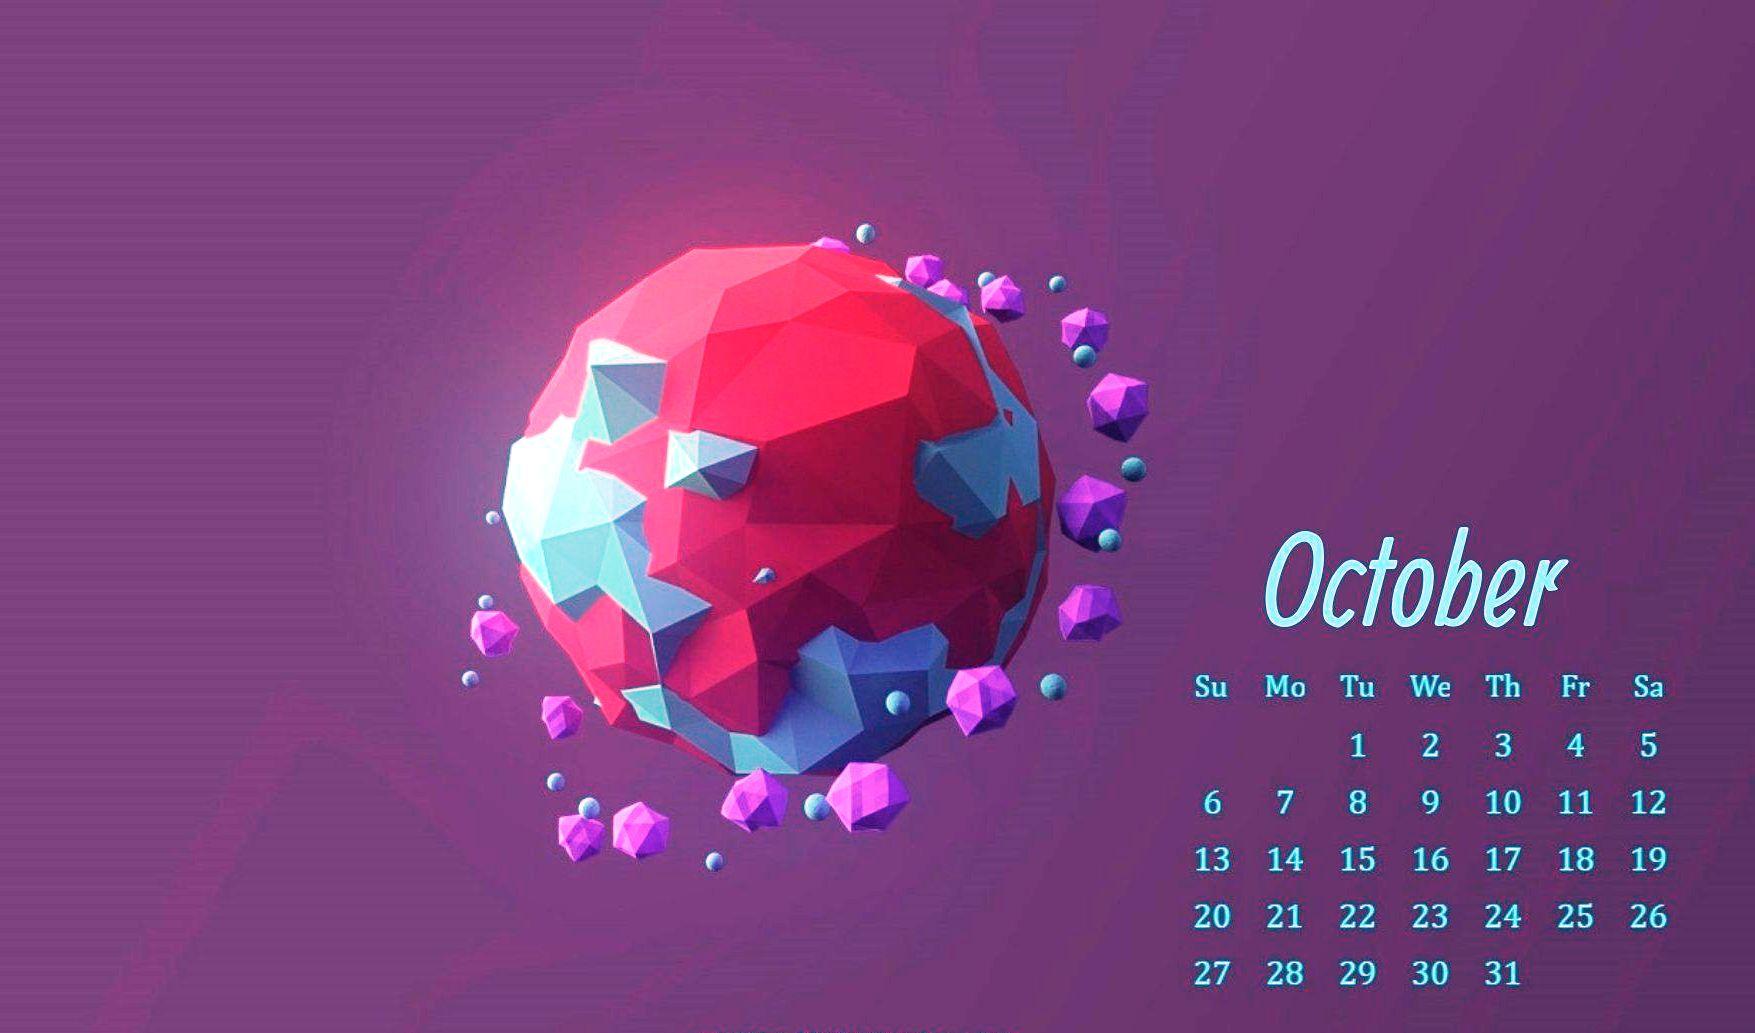 Floral October 2019 Calendar Cute Wallpaper Pink Designs